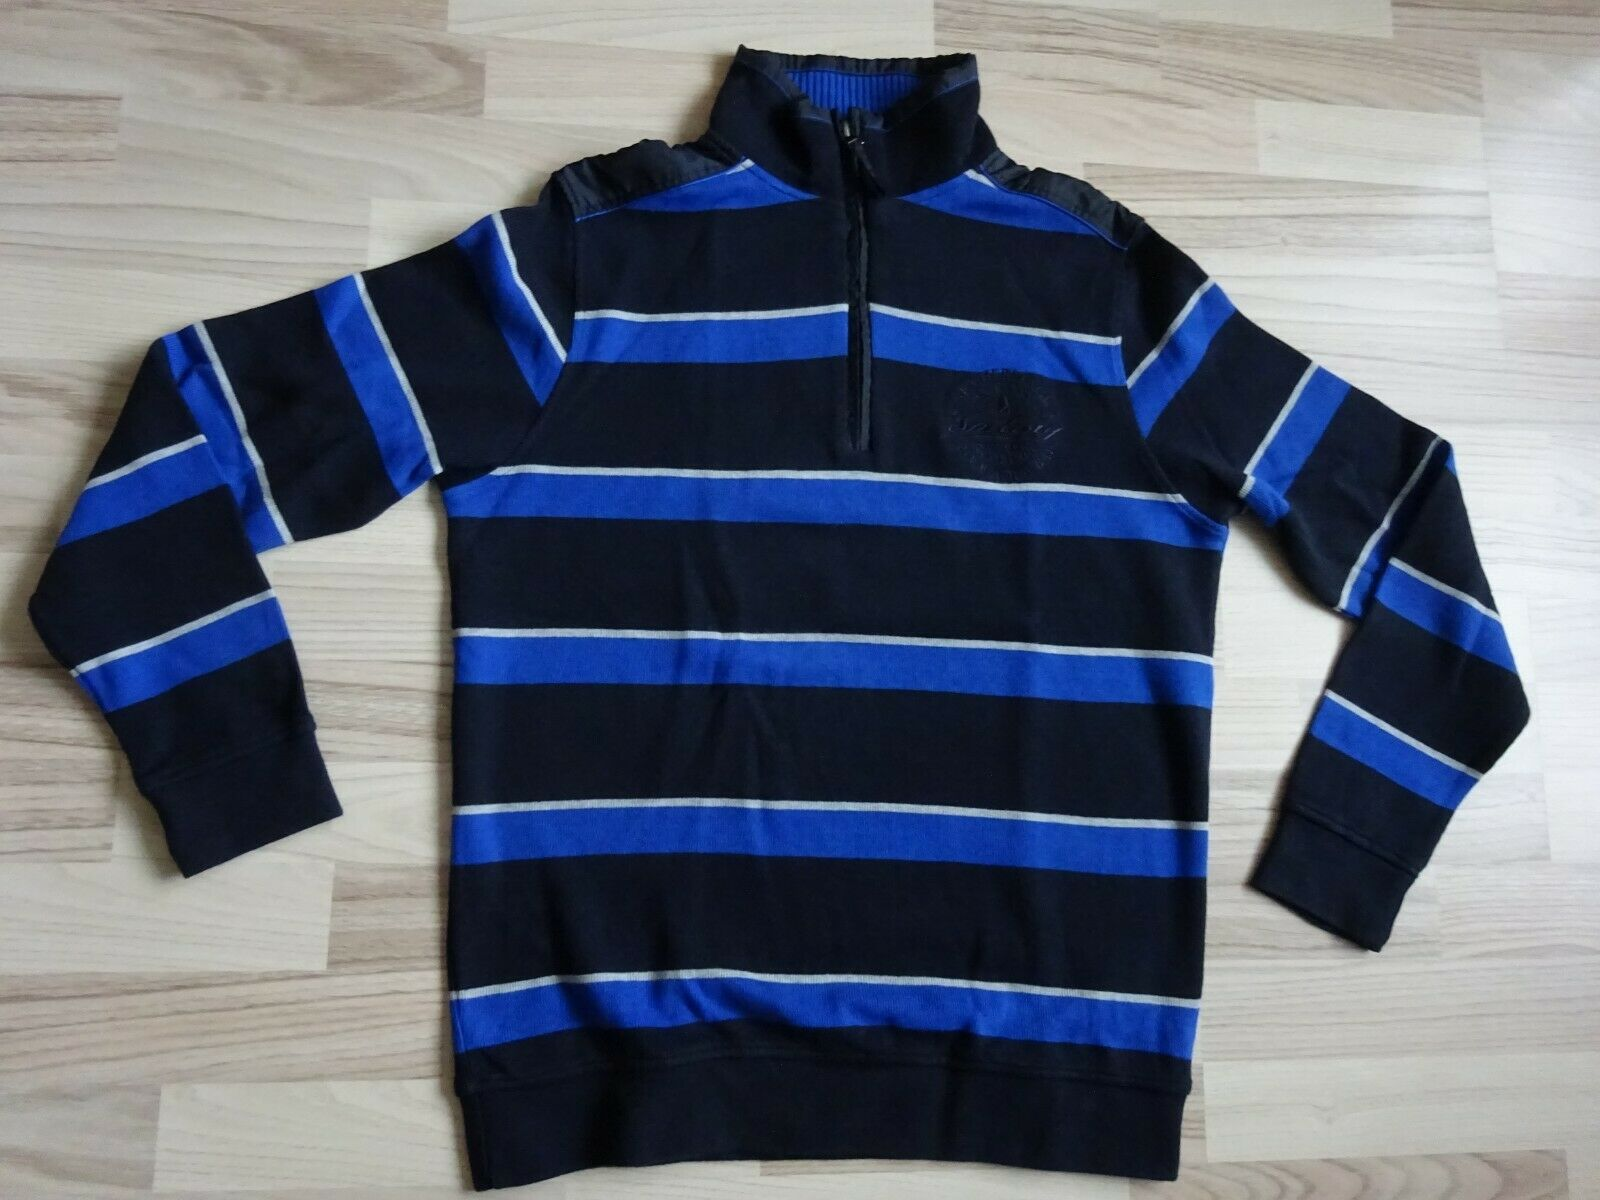 Ragman Sweatshirt Troyer Pullover Segelpullover Maritim Gr. M 50 52 52 52 TOP | Niedriger Preis  170bb8